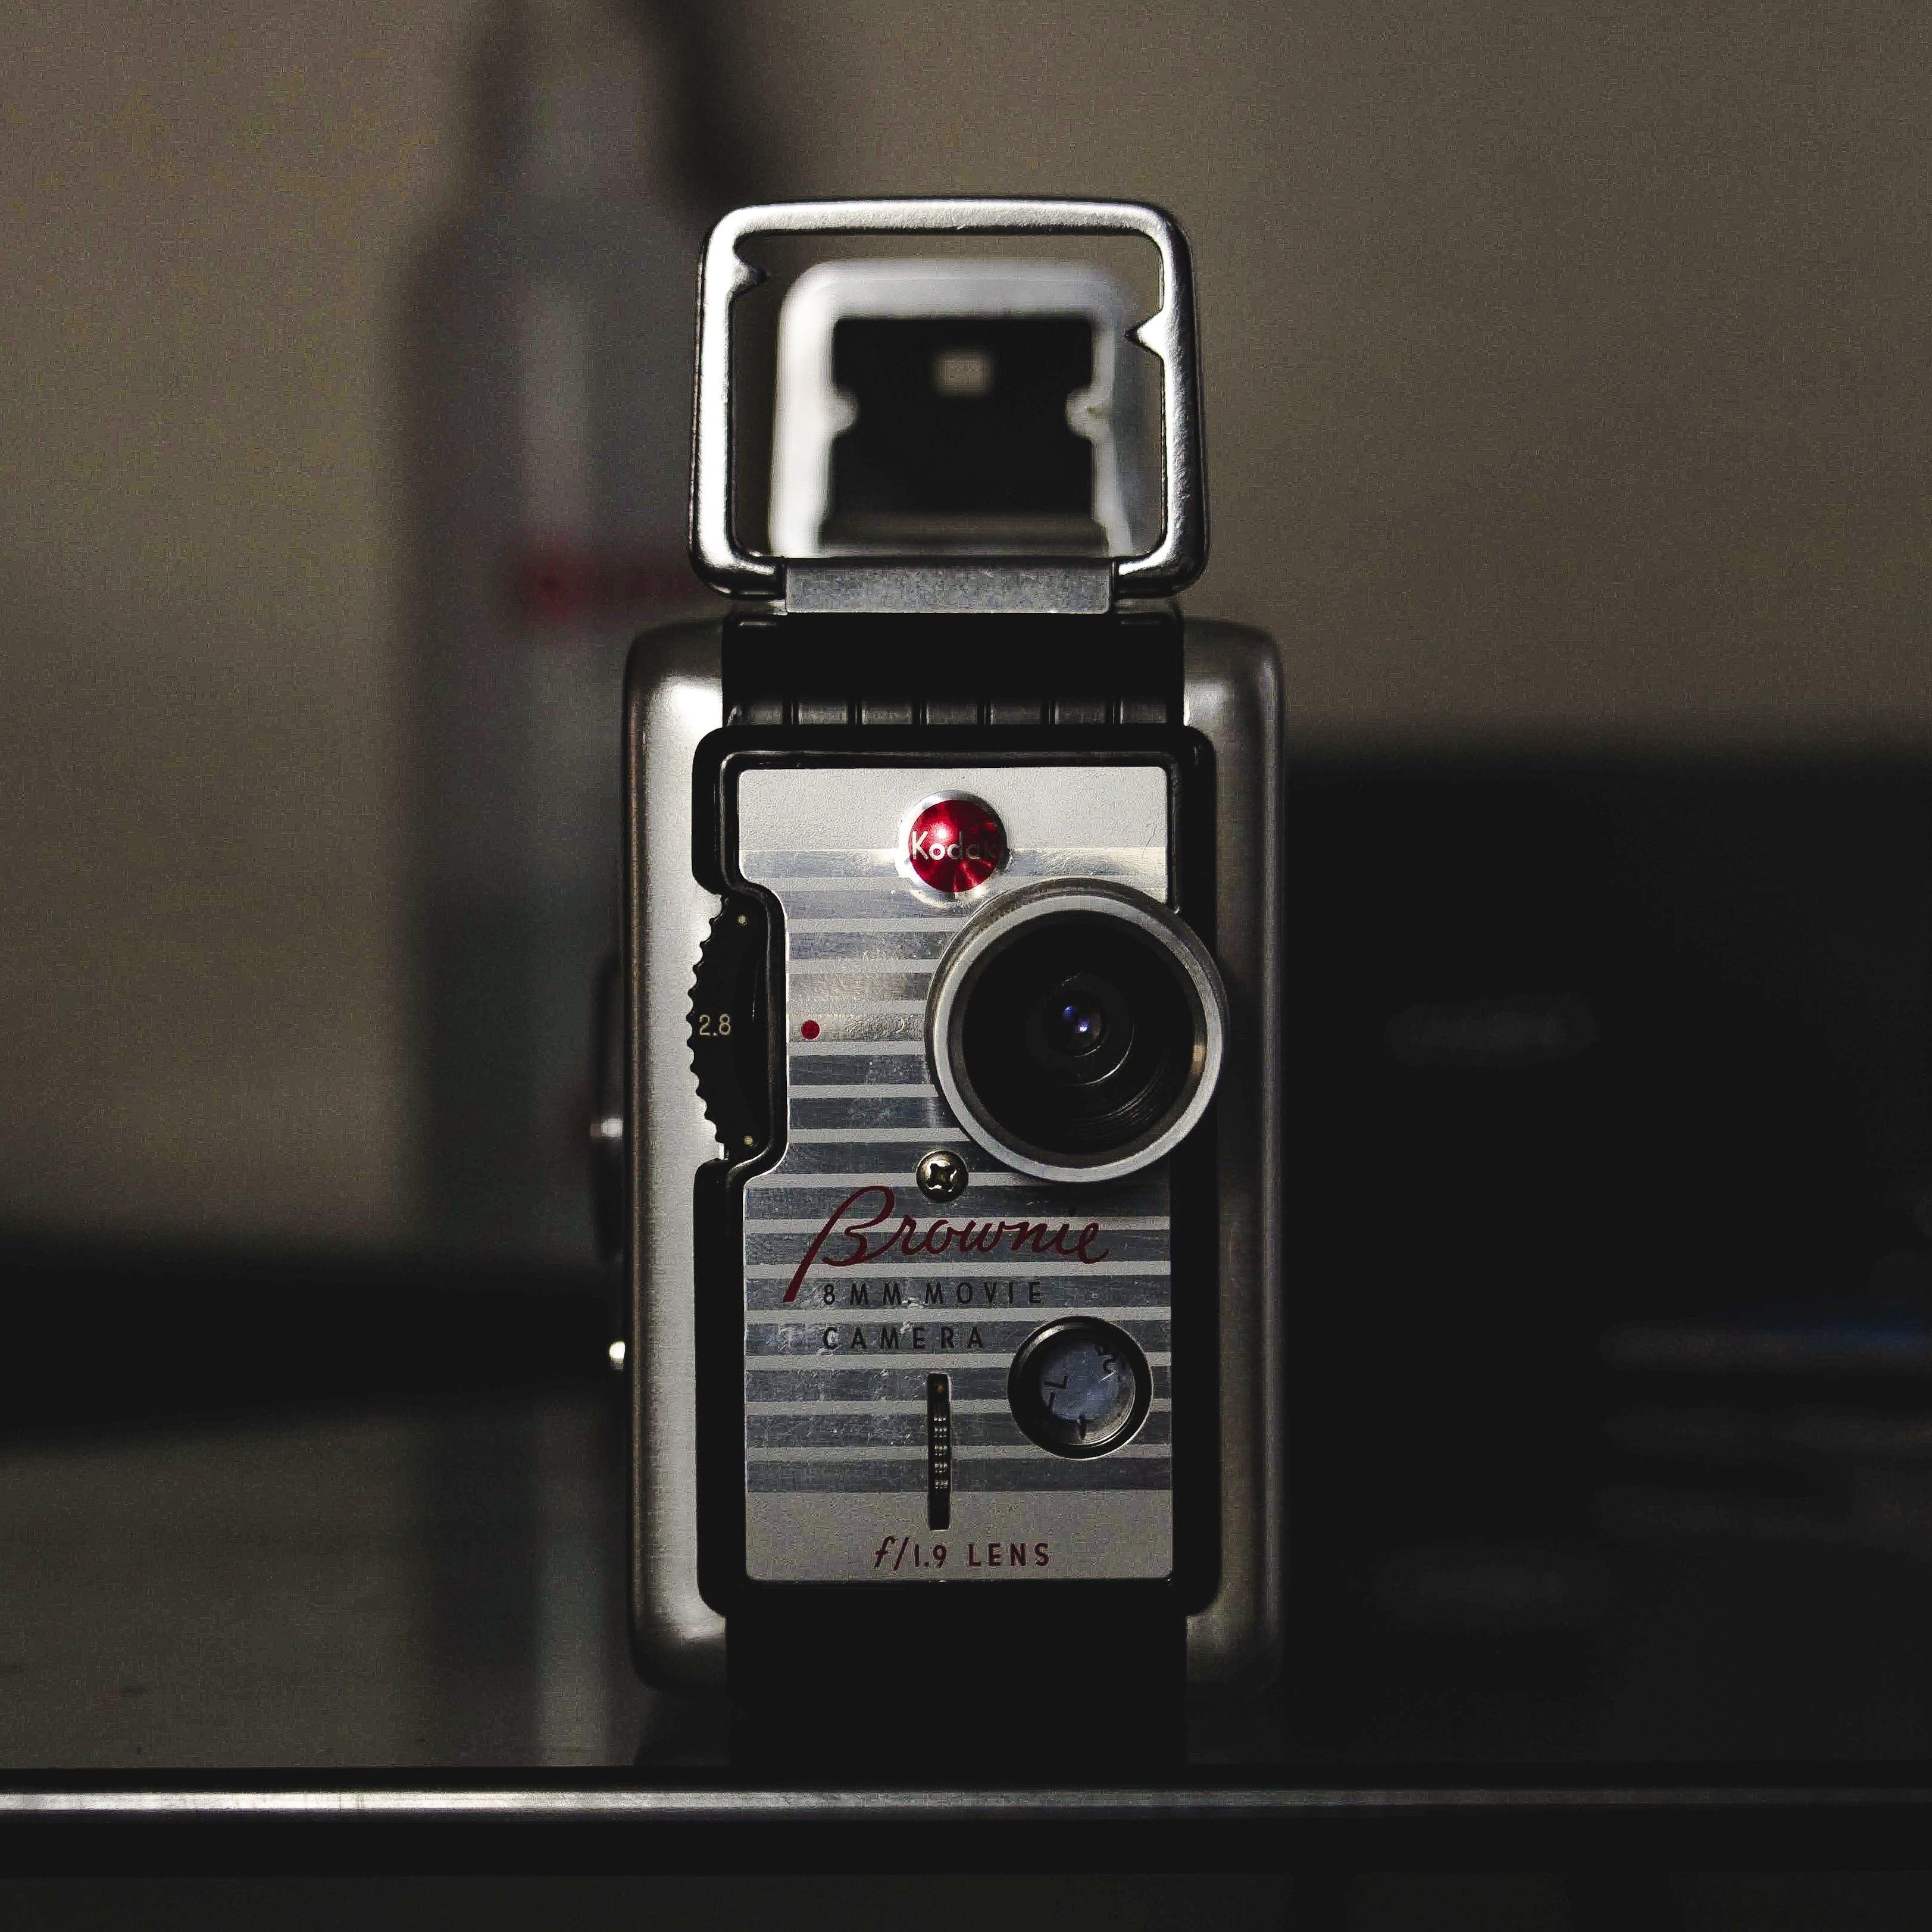 Close-Up Photo of Kodak Brownie Camera